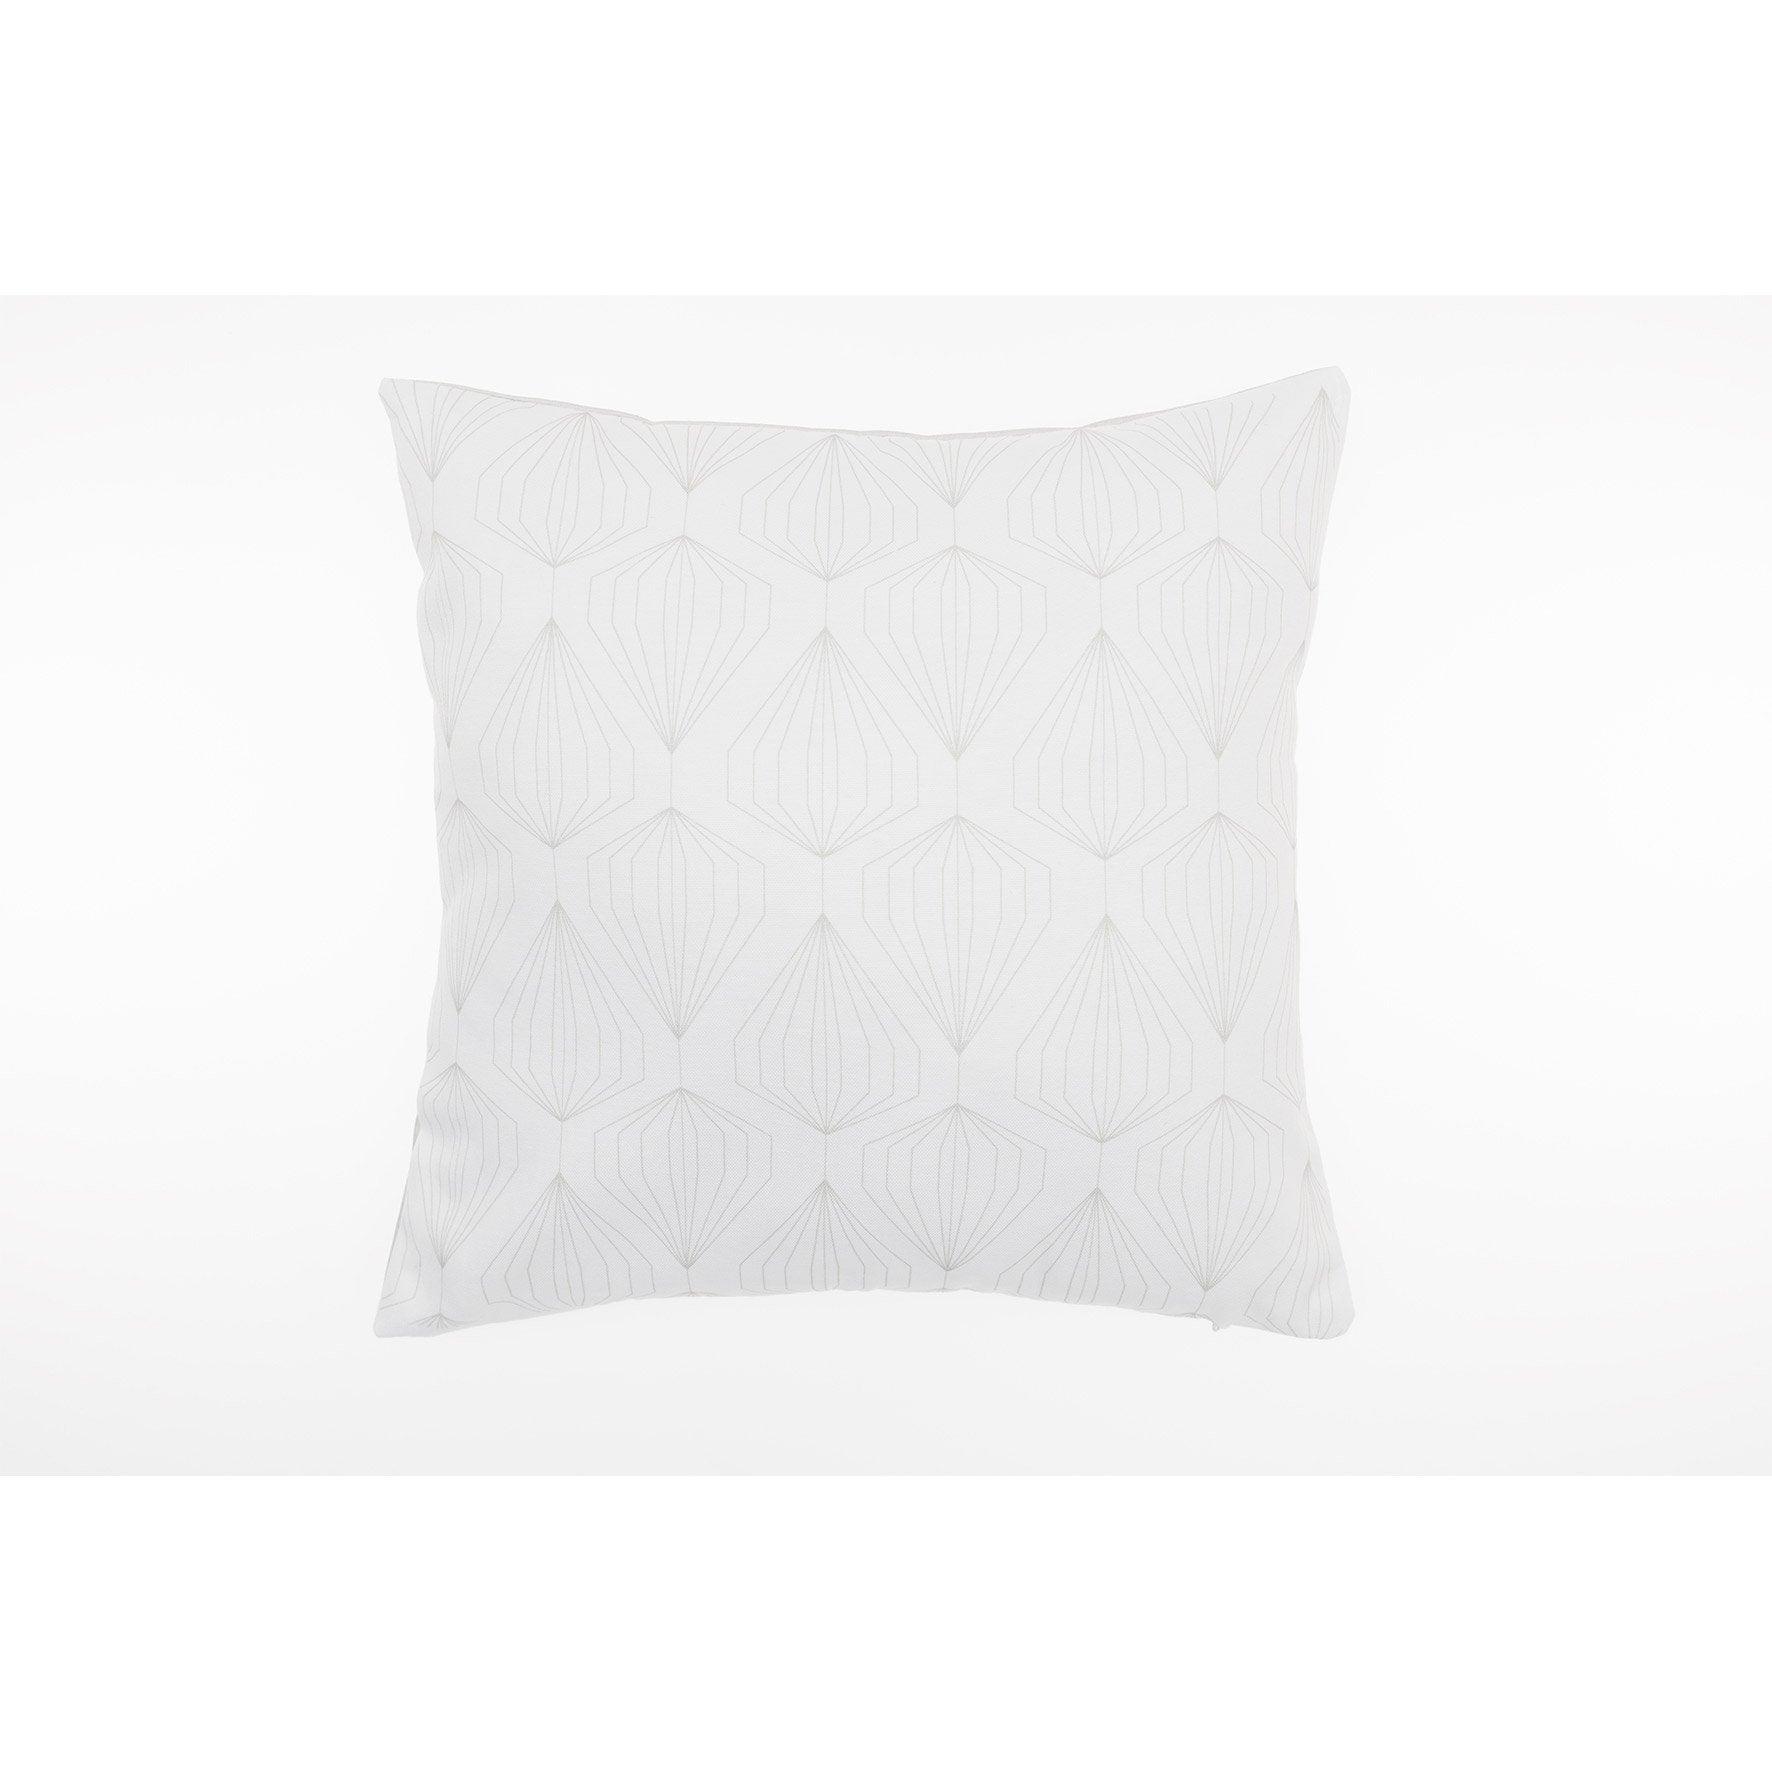 Coussin Diams JBY, blanc / gris l.40 x H.40 cm